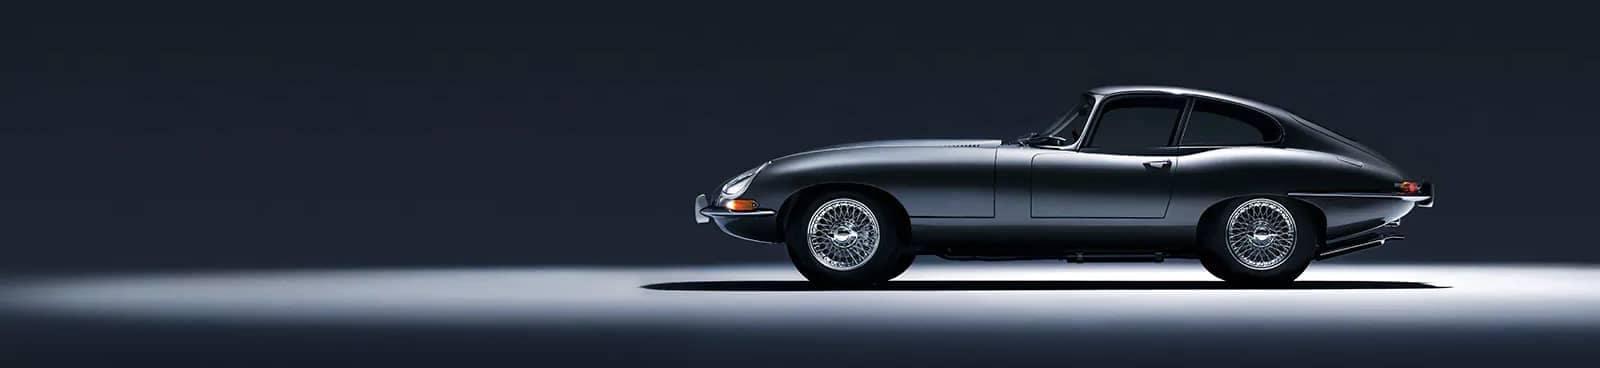 Classic Jaguar E-Type profile